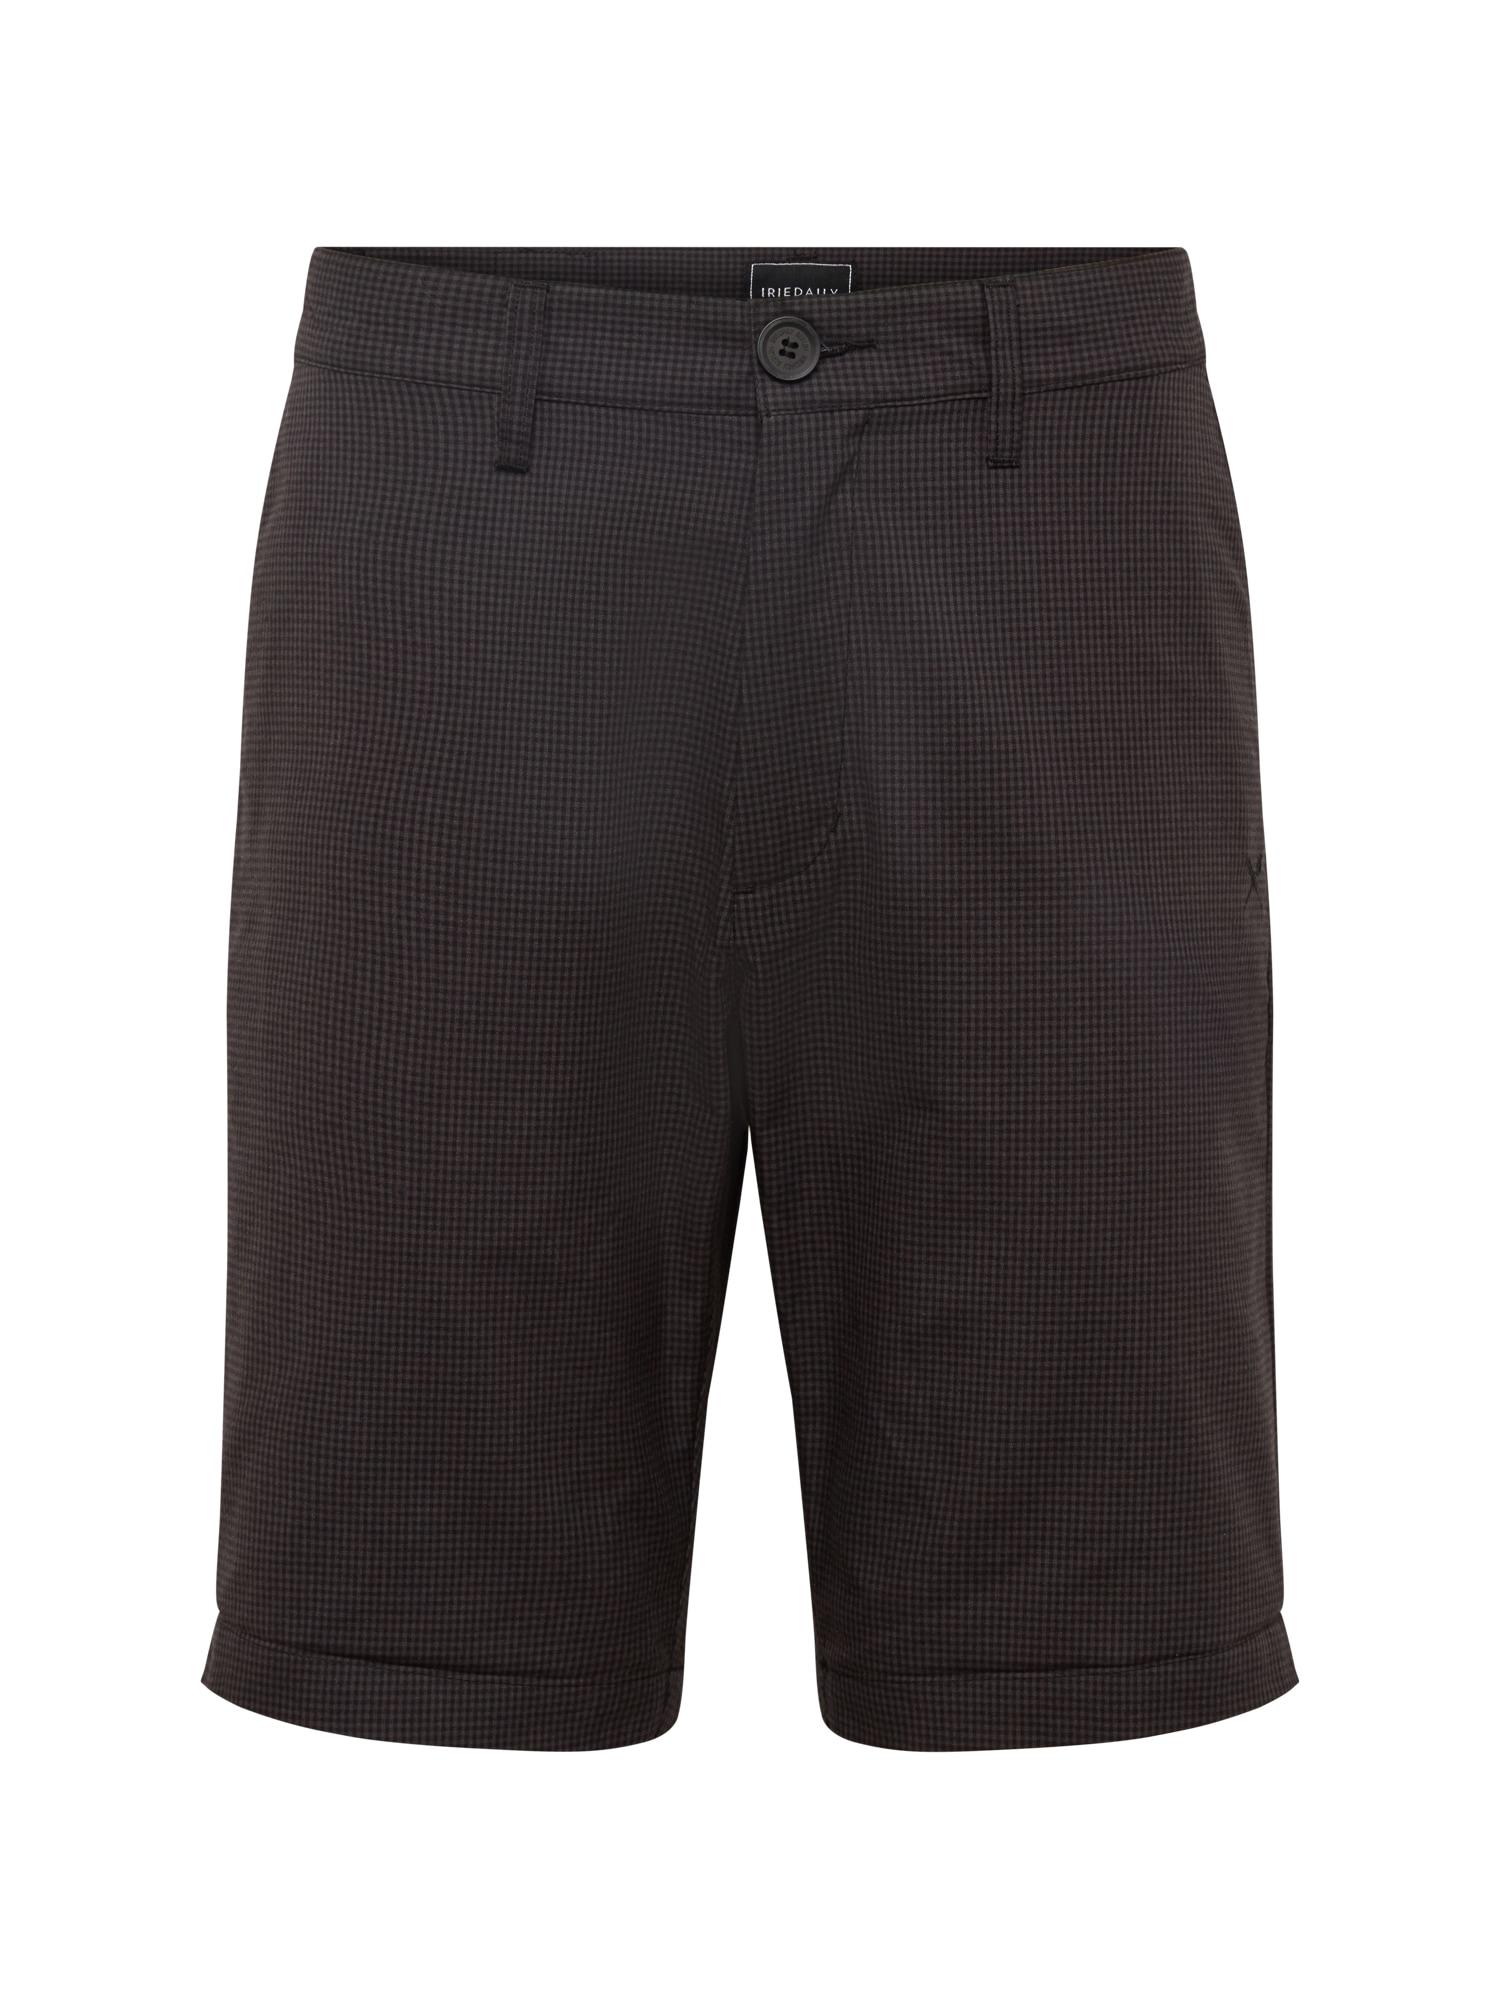 Kalhoty GSE 2.0 Short černá Iriedaily